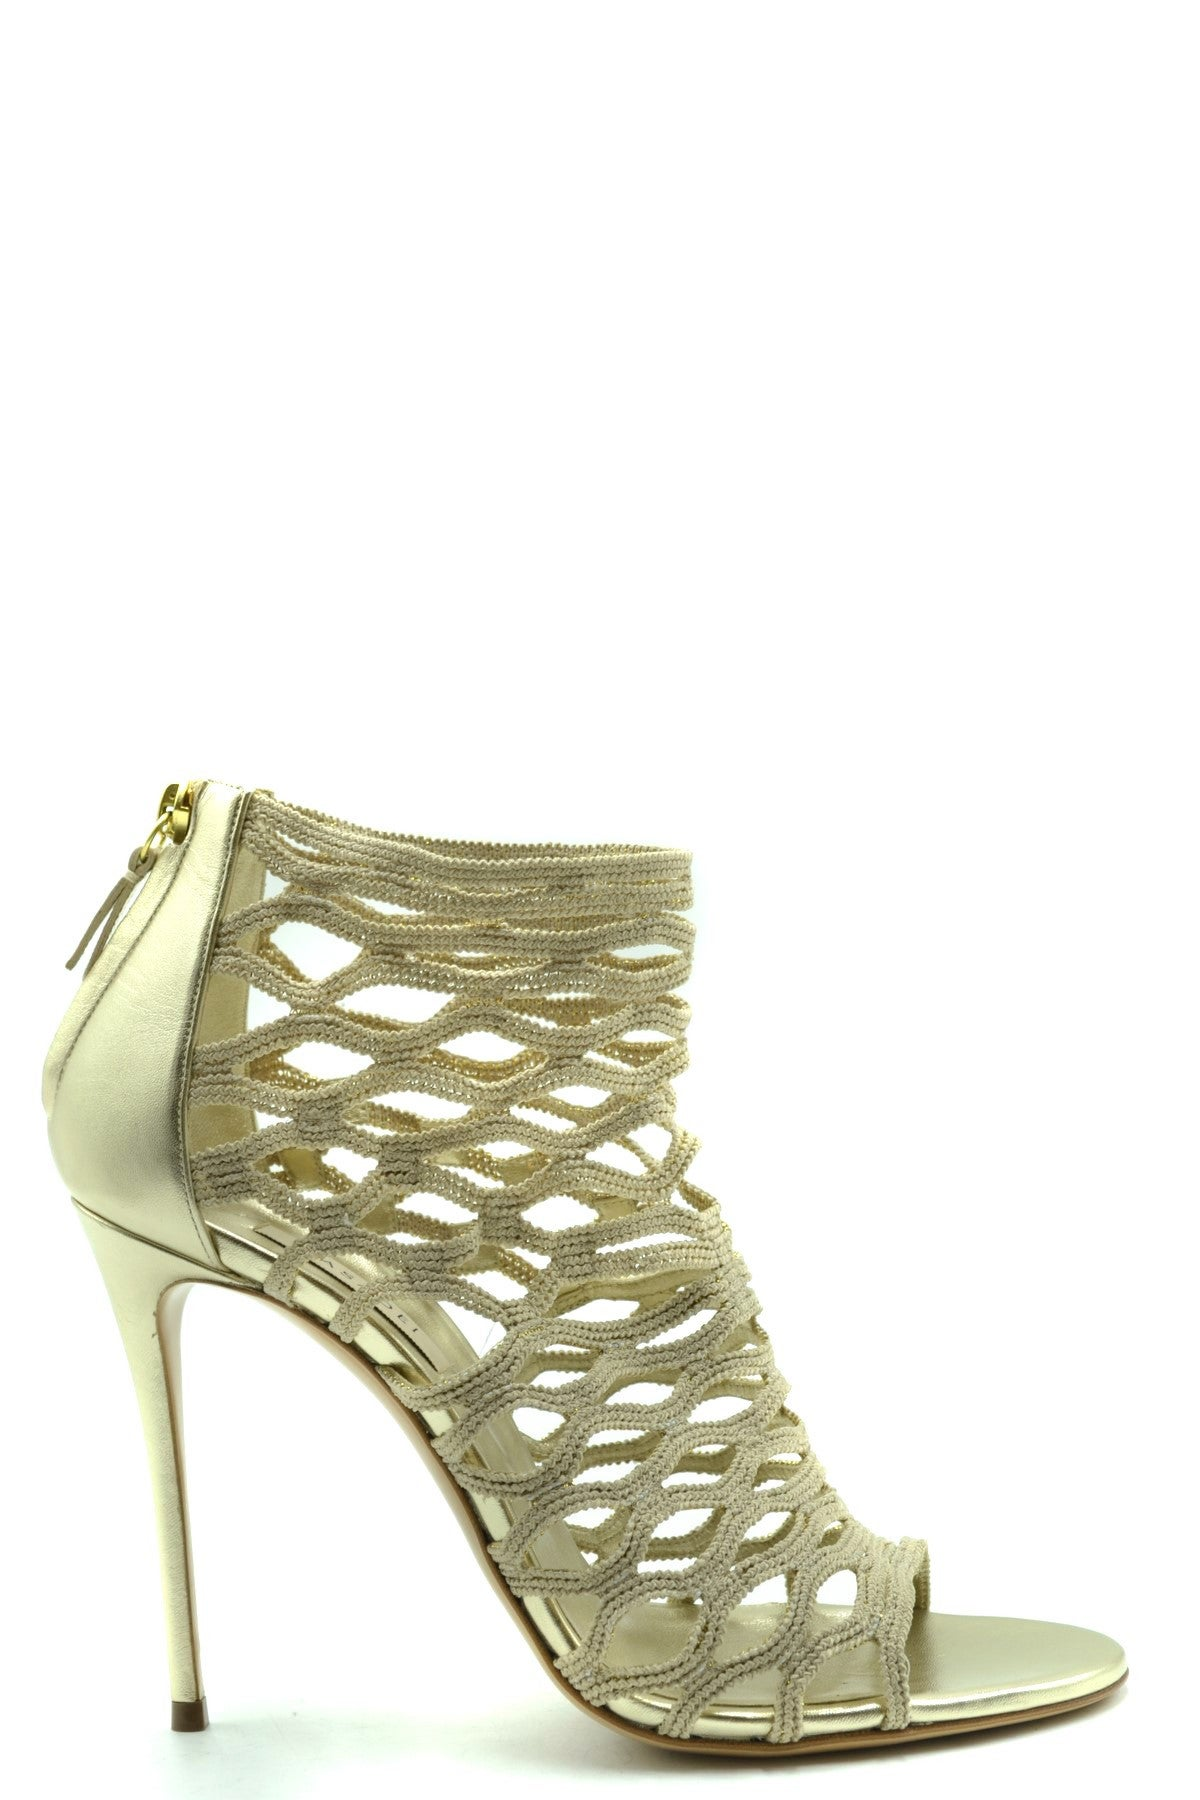 Casadei Women's Sandals In Beige